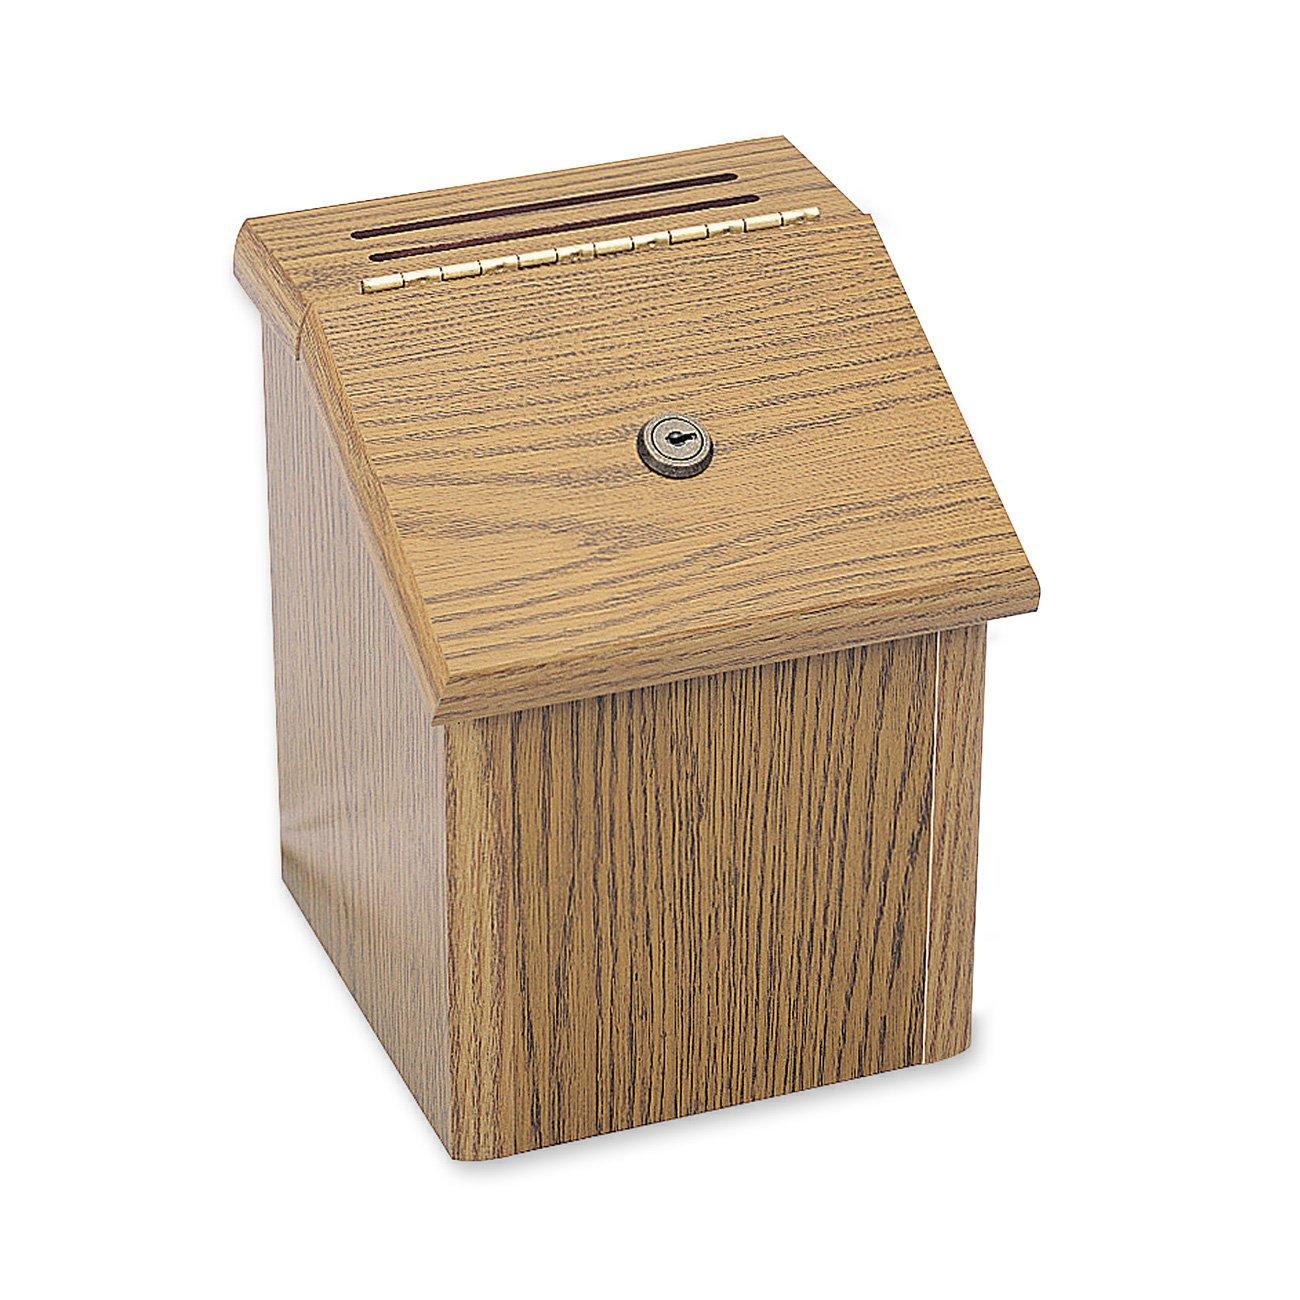 Safco Products 4230MO Wood Locking Suggestion Box, Medium Oak